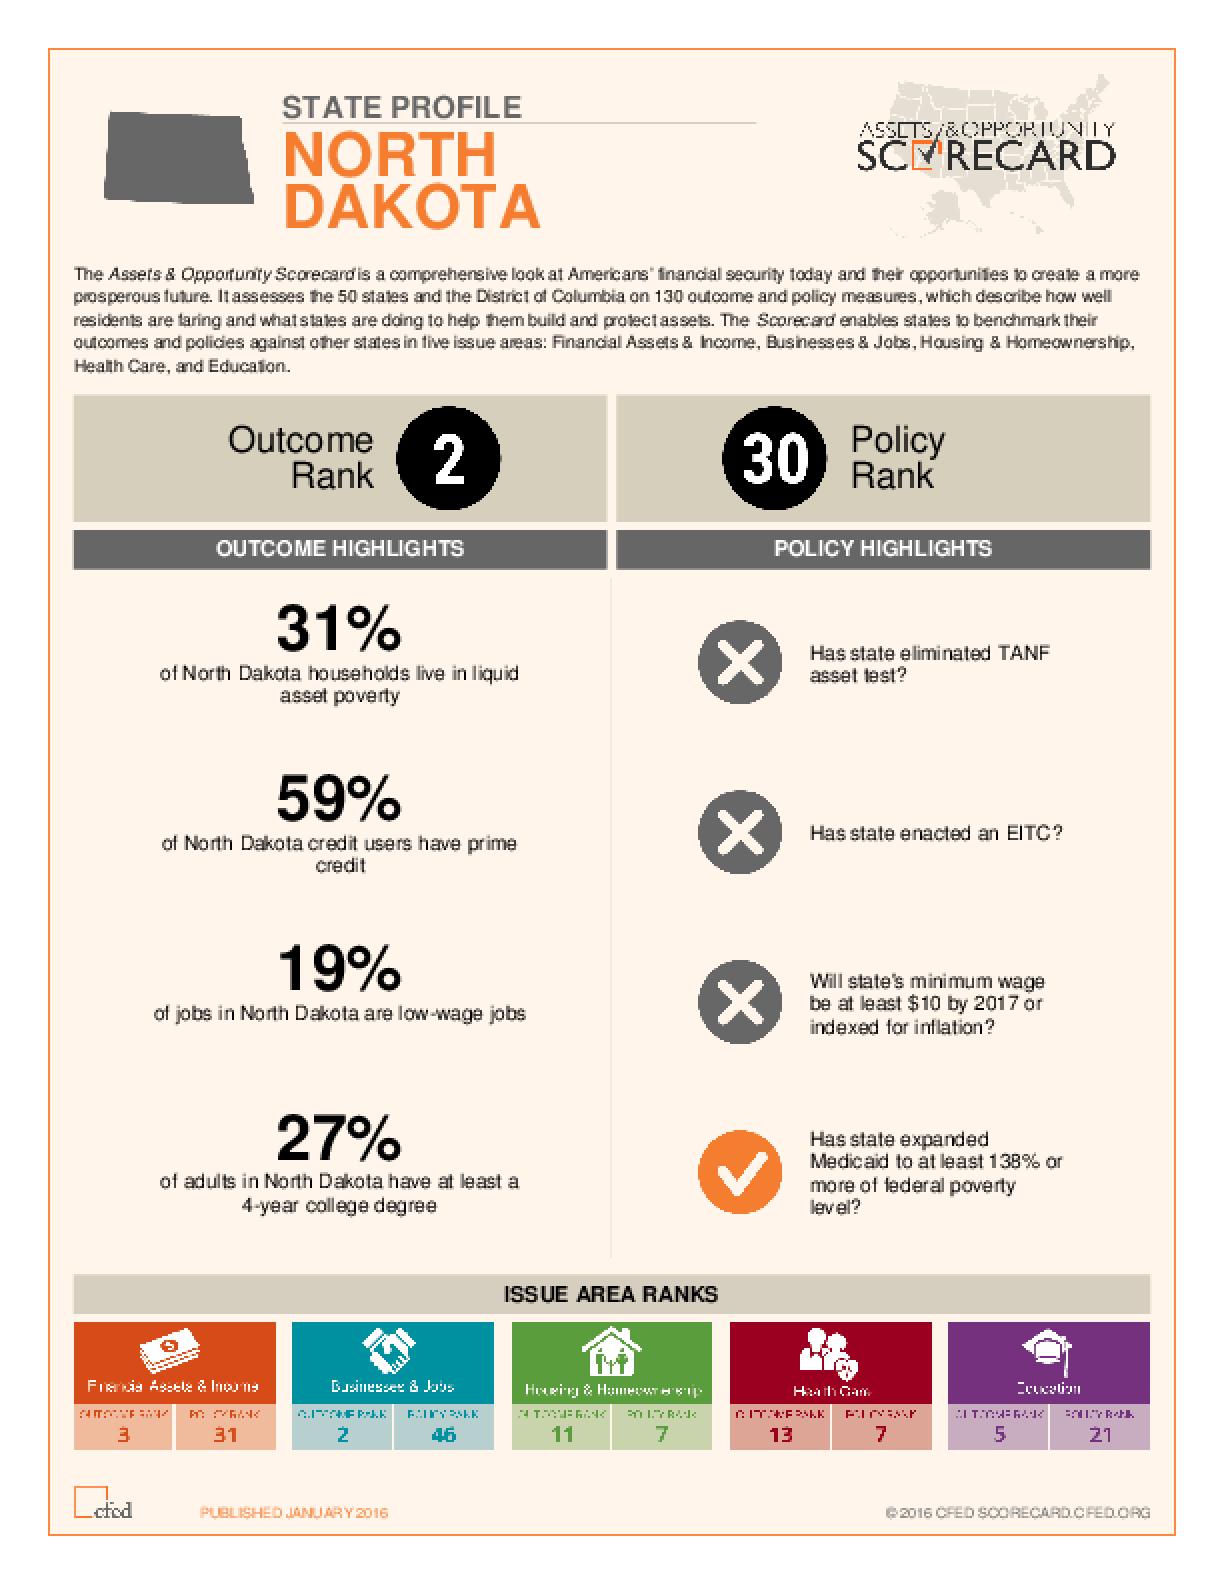 State Profile North Dakota: Assets and Opportunity Scorecard